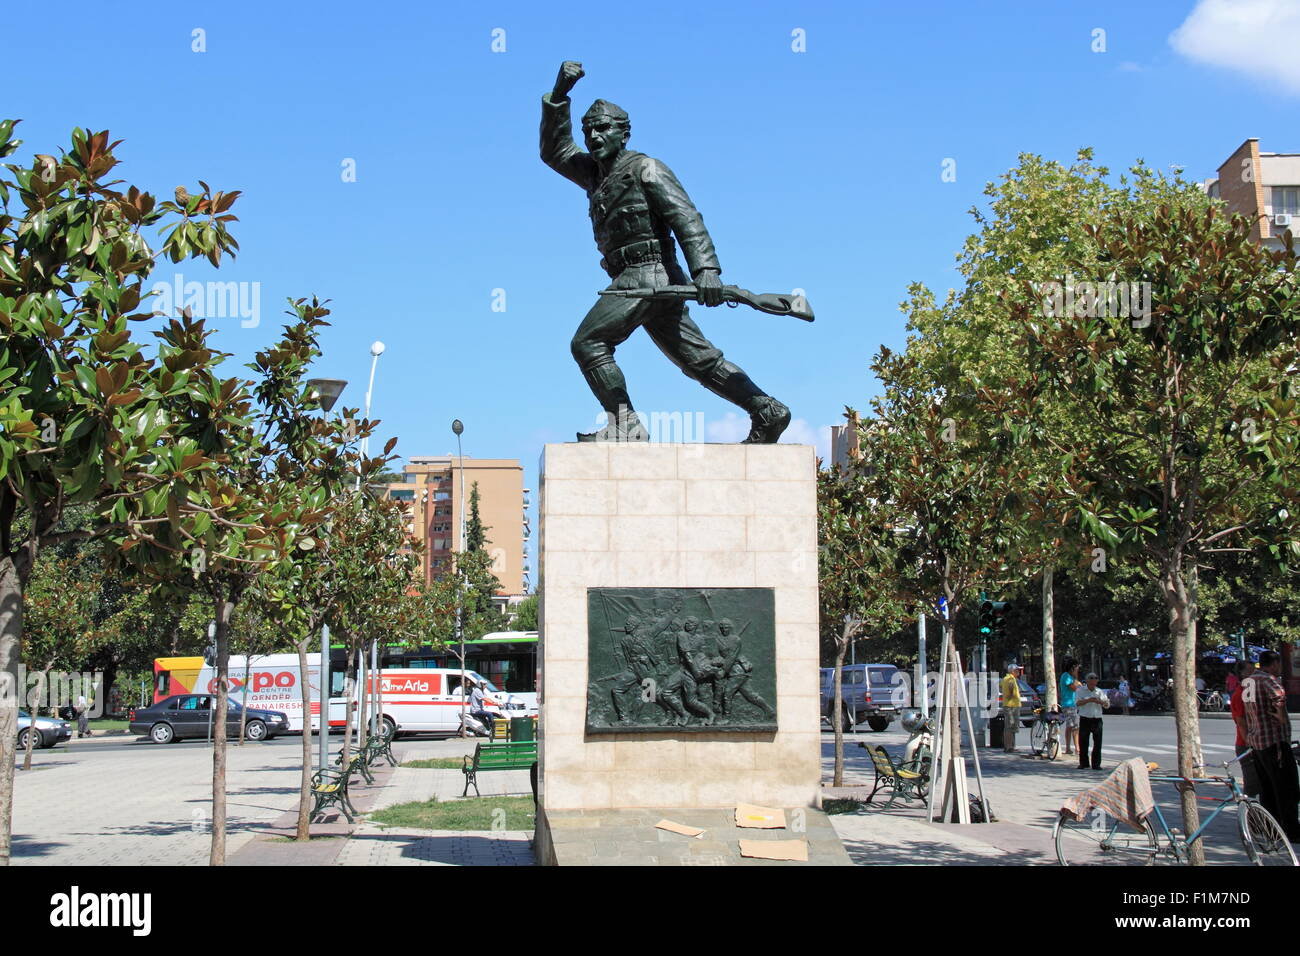 Denkmal für einen unbekannten Partisan, Rruga Xhorxhi W Bush, Tirana, Albanien, Balkan, Europa Stockfoto